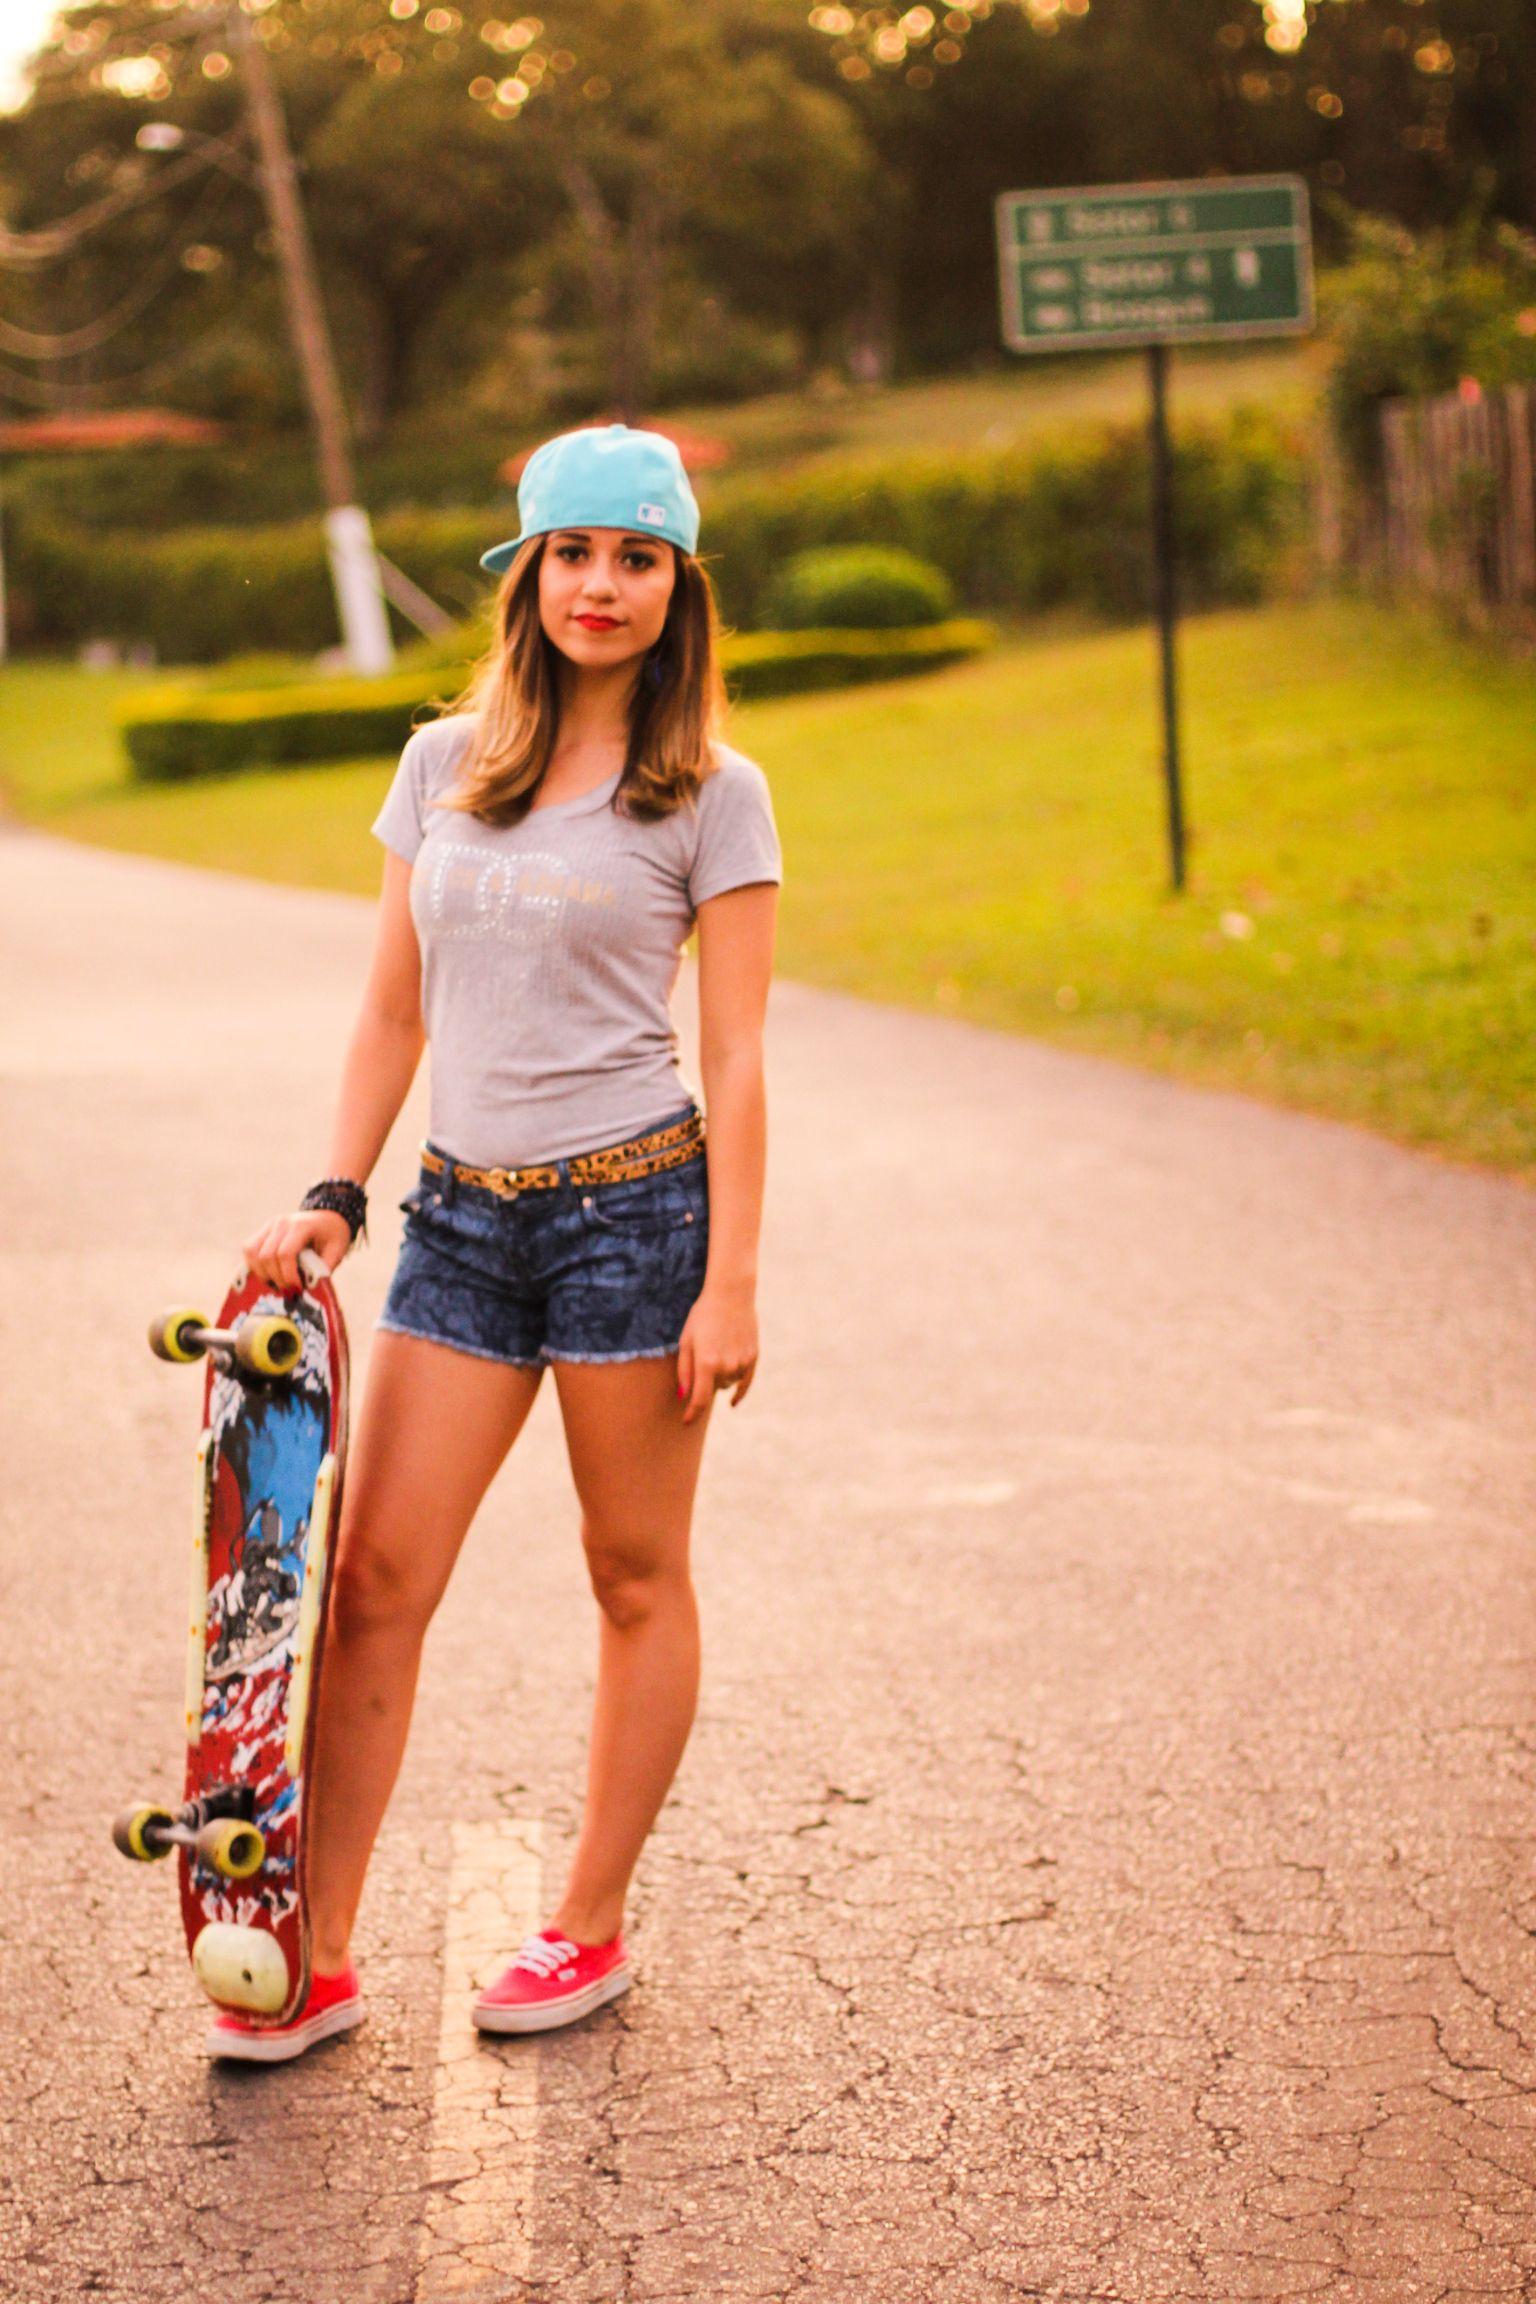 Девушки на скейтбордах картинки